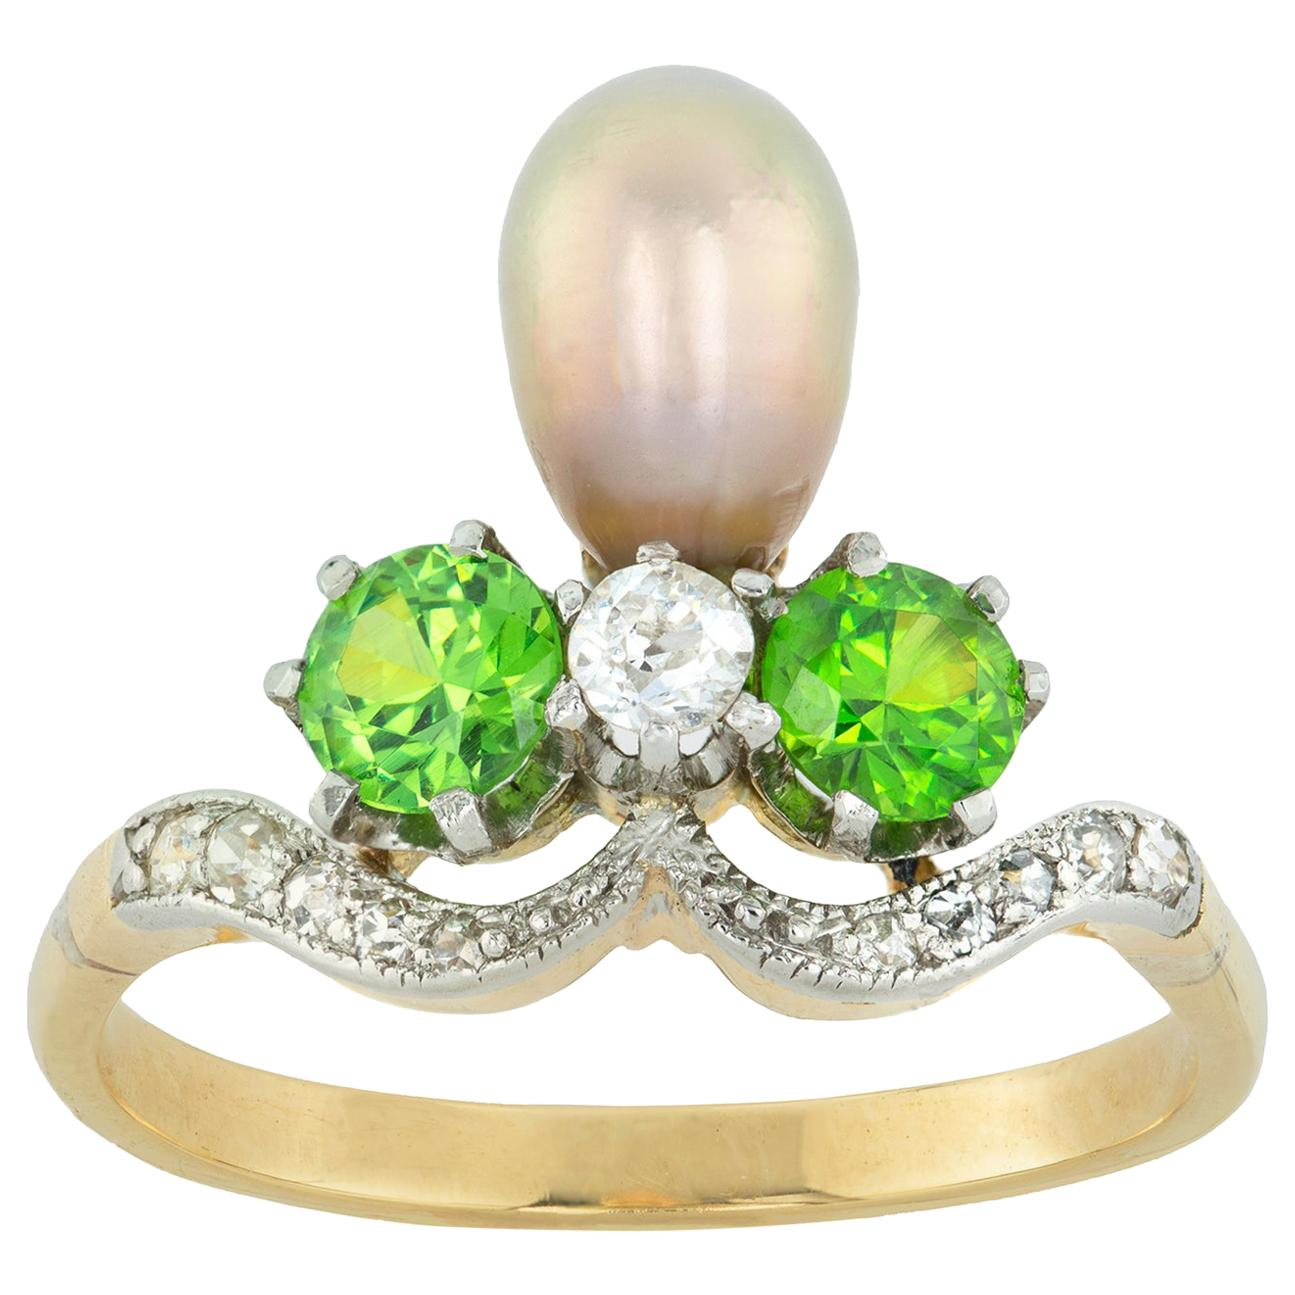 Belle Époque Natural Pearl, Garnet and Diamond Ring